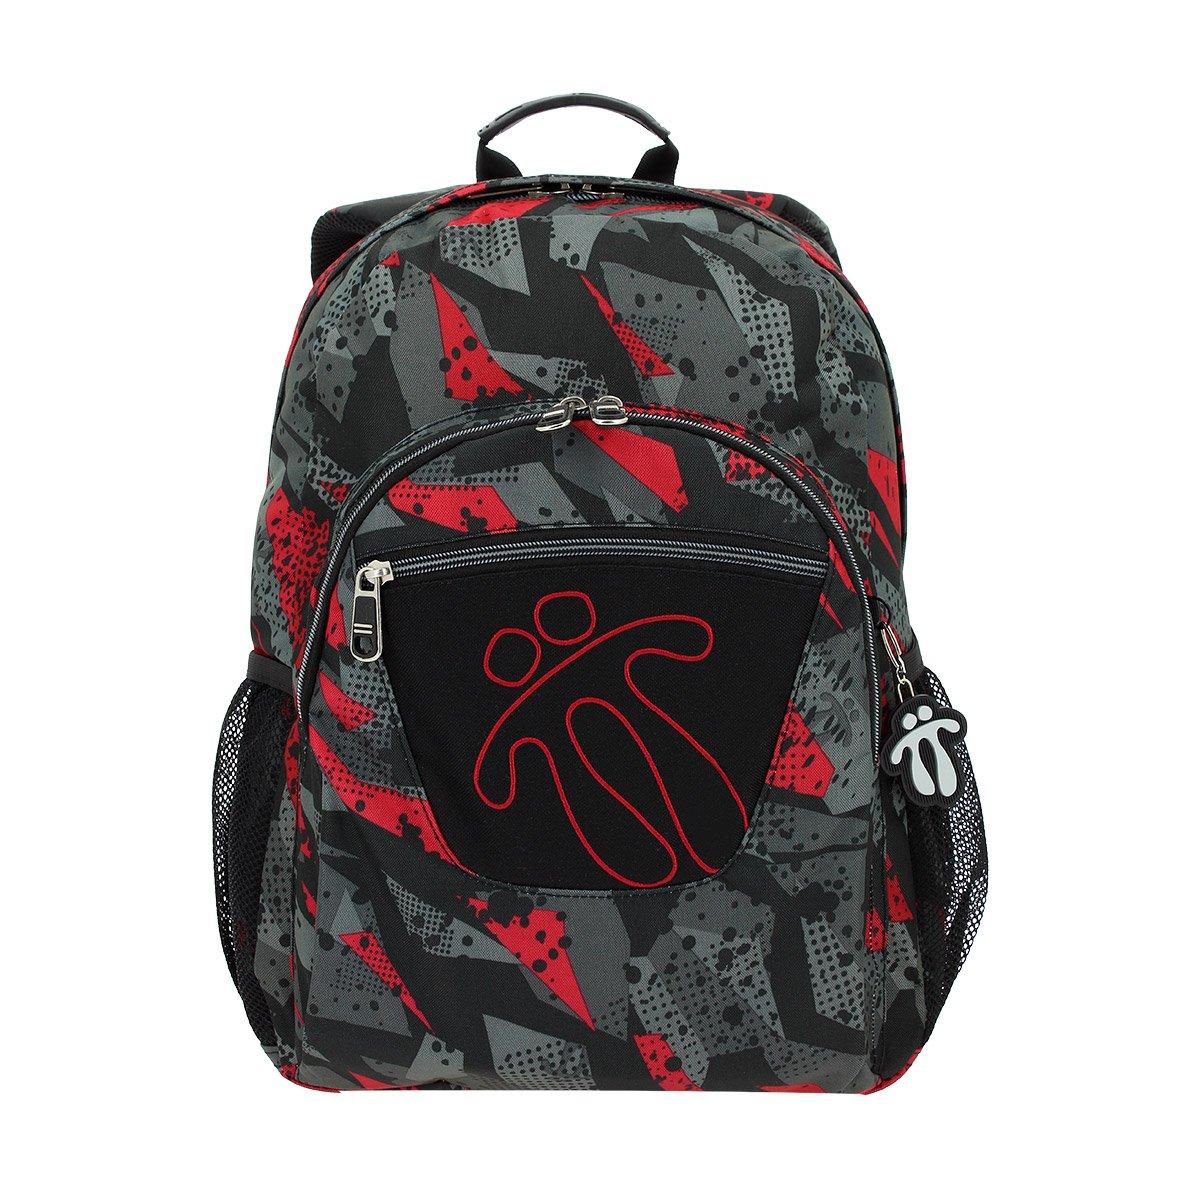 TOTTO Mochila Escolar Adaptable A Carro, Grande Infantil – Mochilas Children's Backpack, 44 cm, 20 liters, Multicolour (Multicolor)